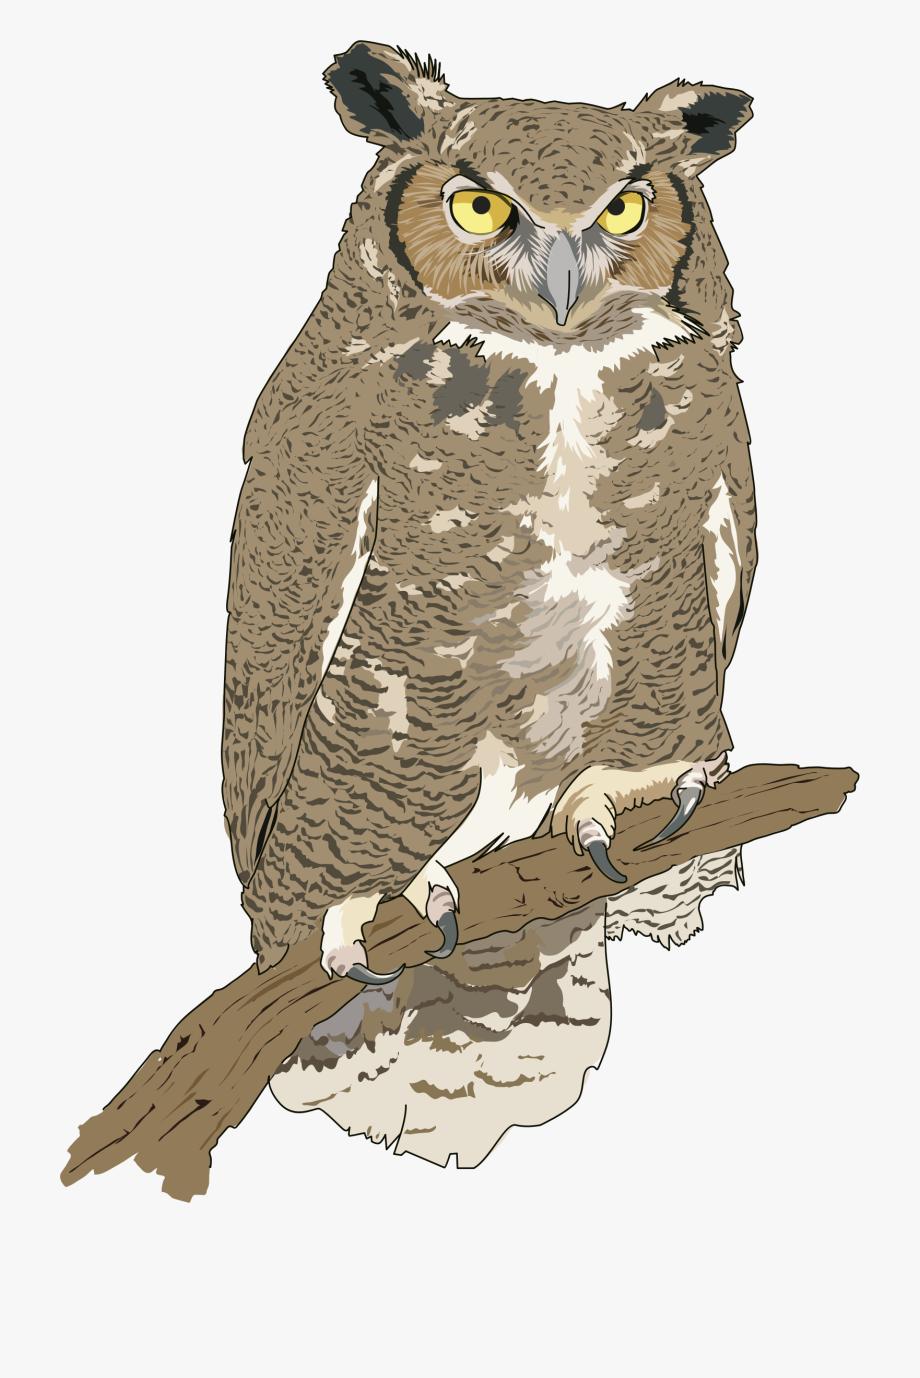 Sleeping owl clipart free svg transparent library Owl Clip Art Png - Eagle Owl Png , Transparent Cartoon, Free ... svg transparent library